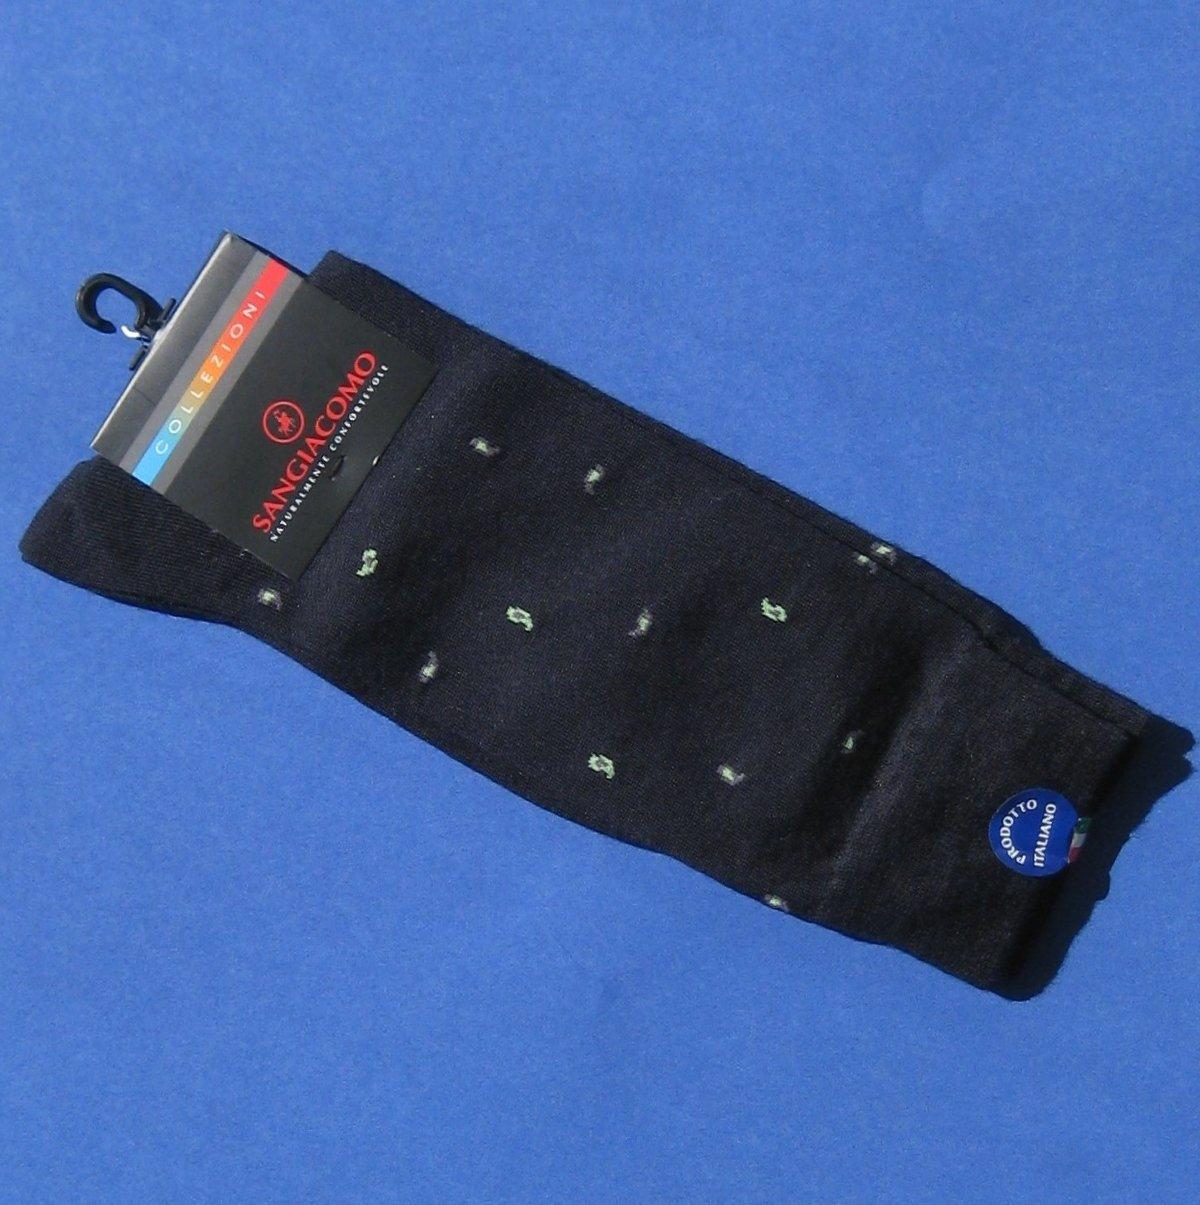 NWT Sangiacomo Blue Cotton Blend Knit Dress Socks